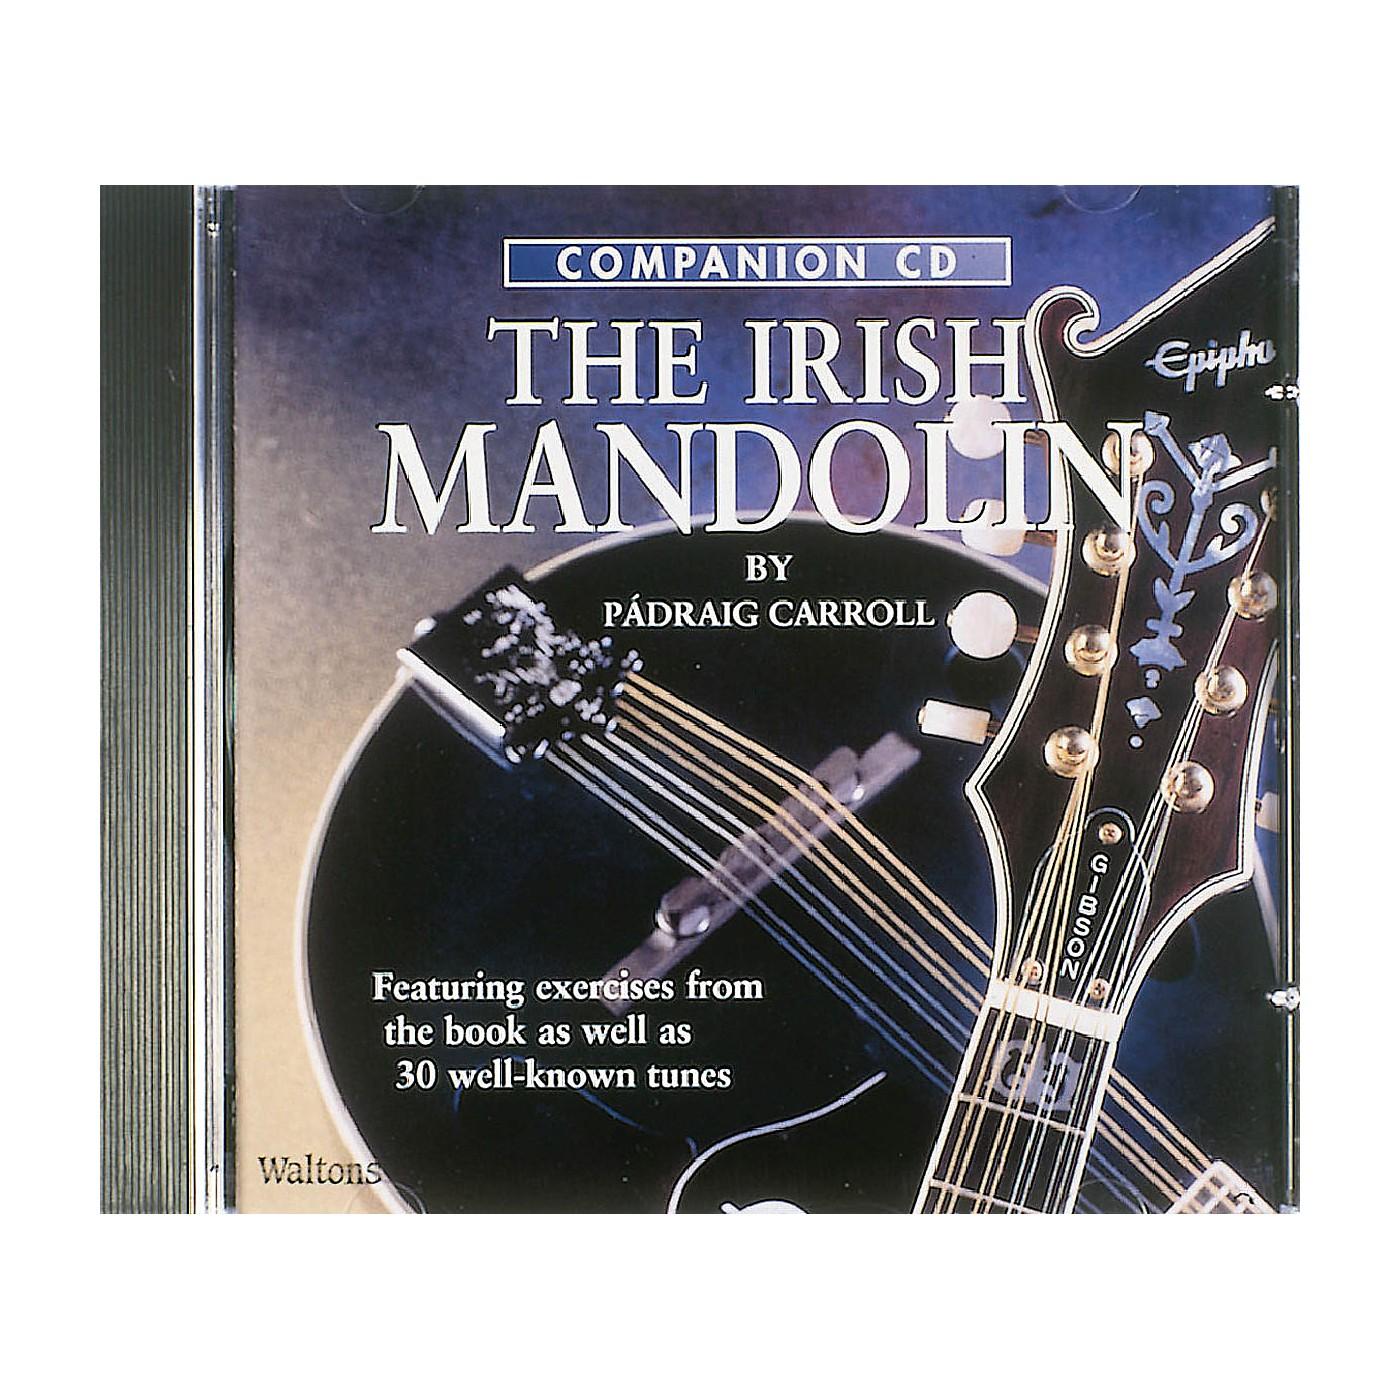 Waltons A Complete Guide to Learning the Irish Mandolin Waltons Irish Music Books Series CD by Padraig Carroll thumbnail